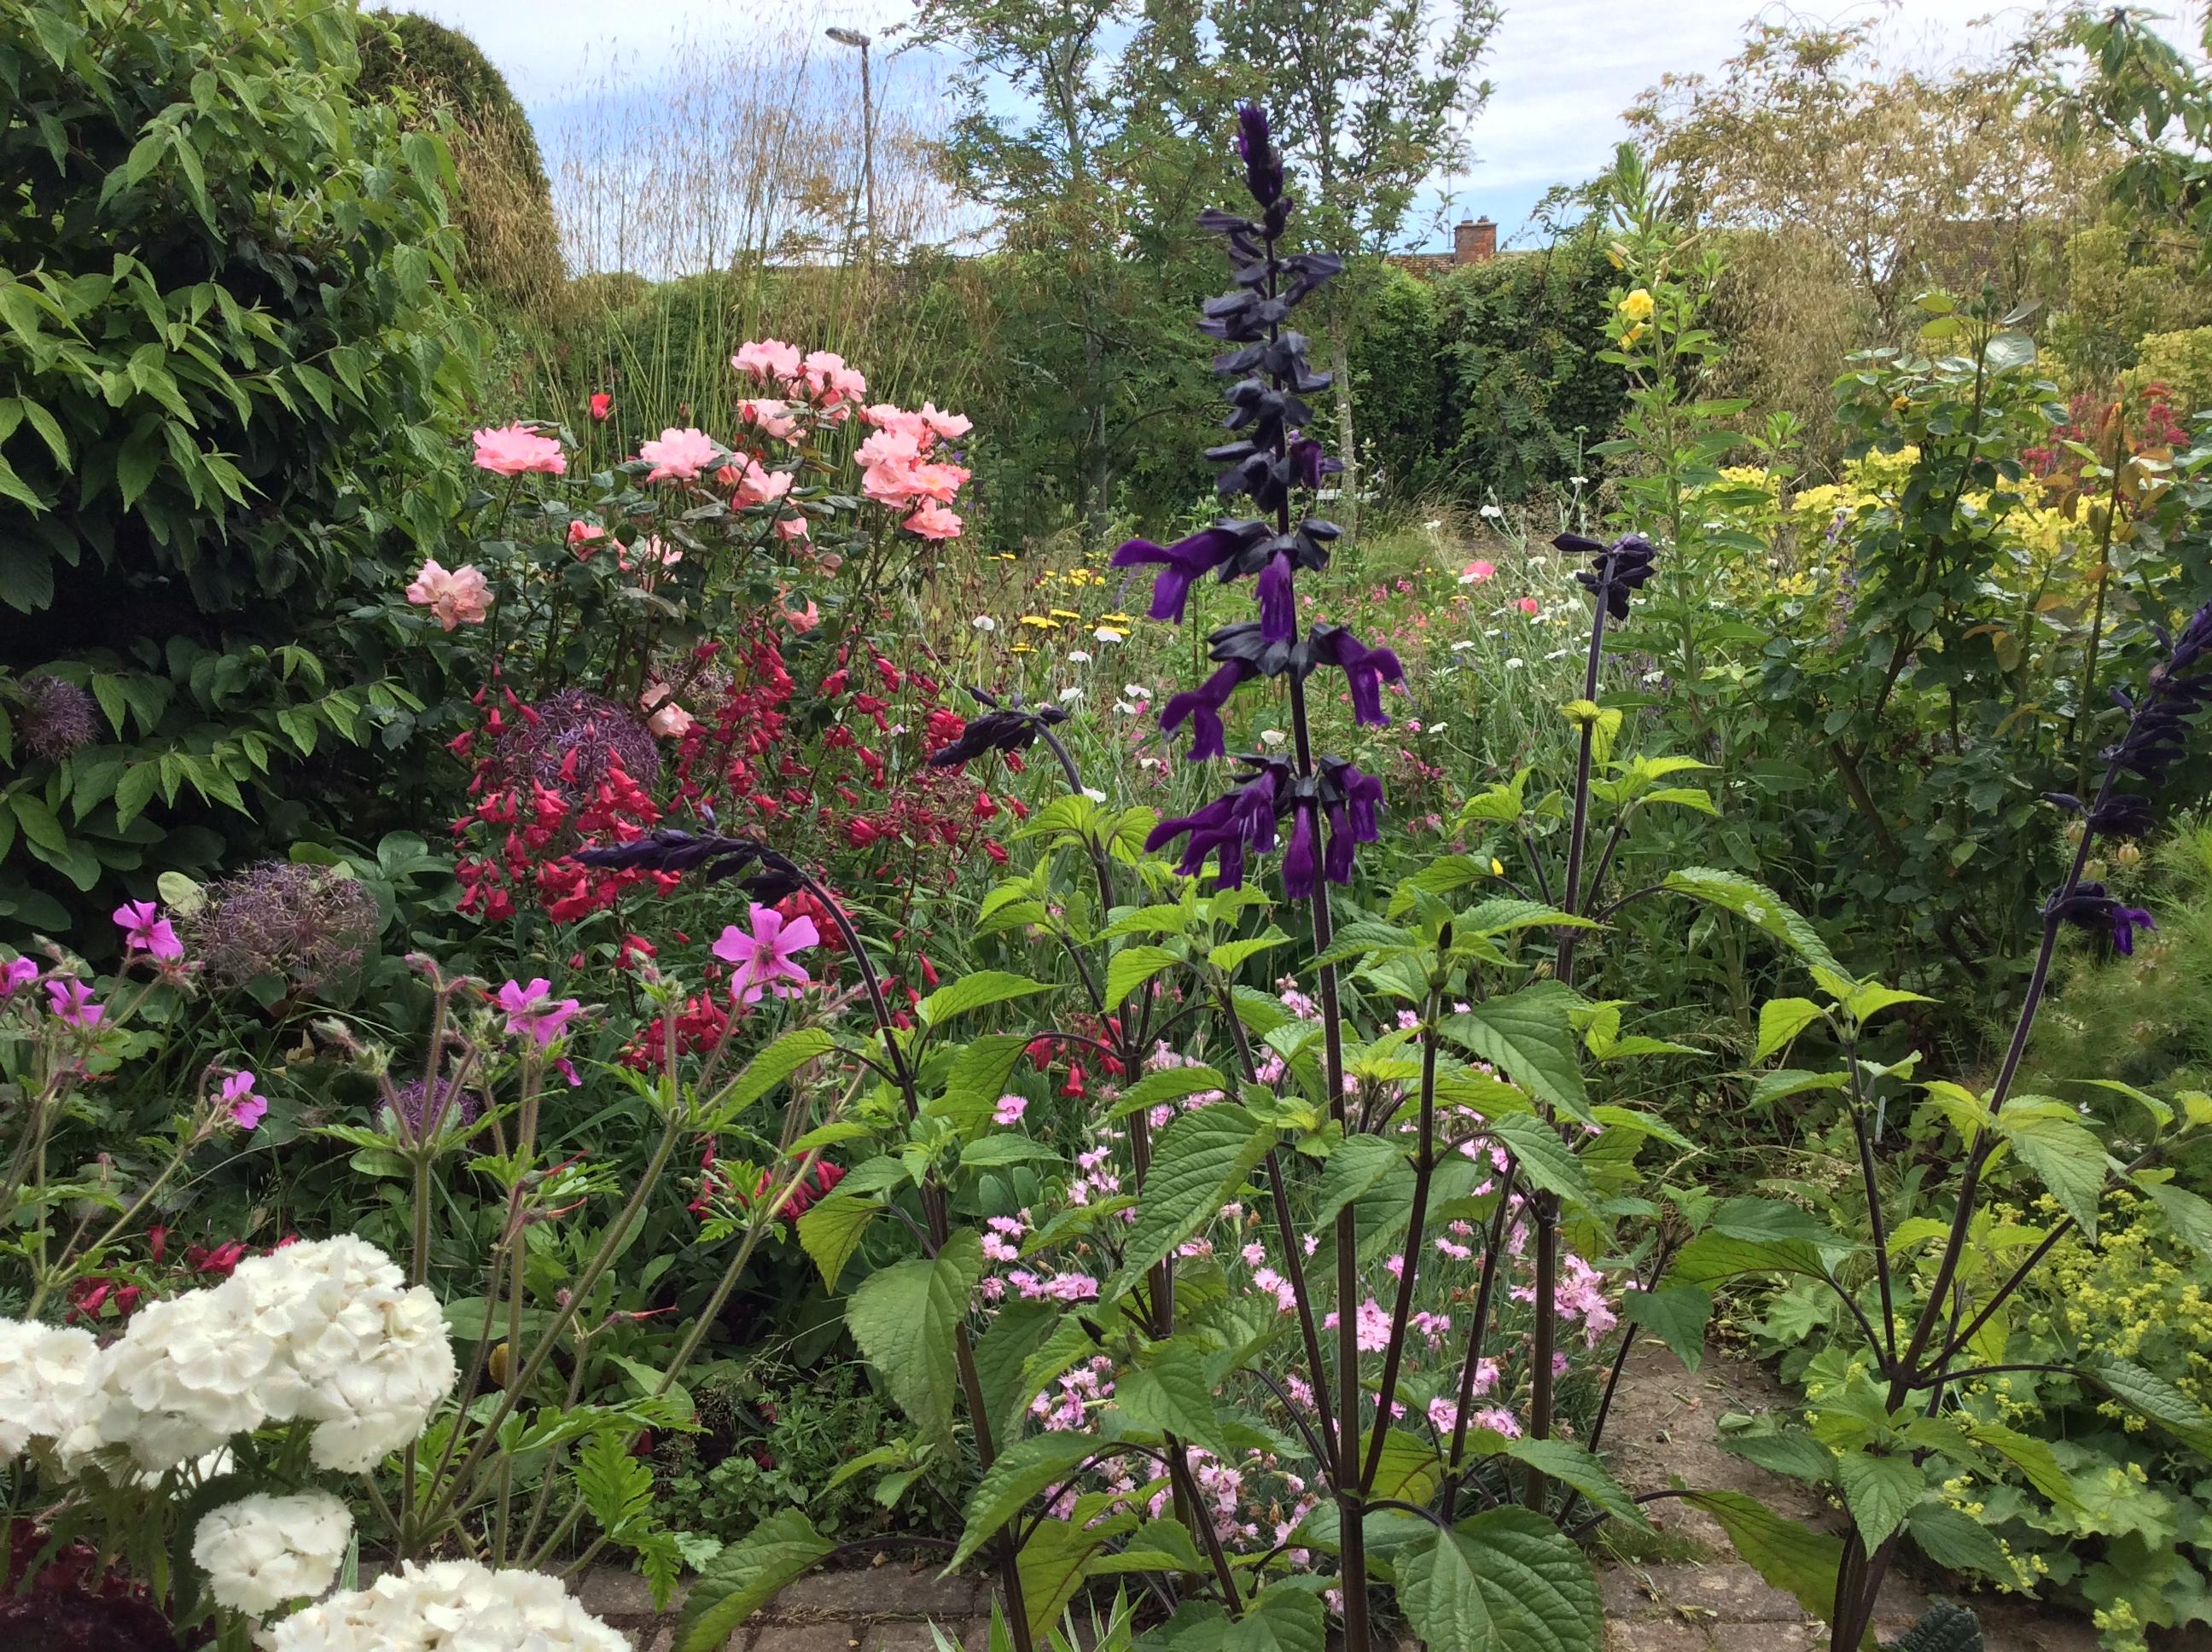 Flower garden with roses